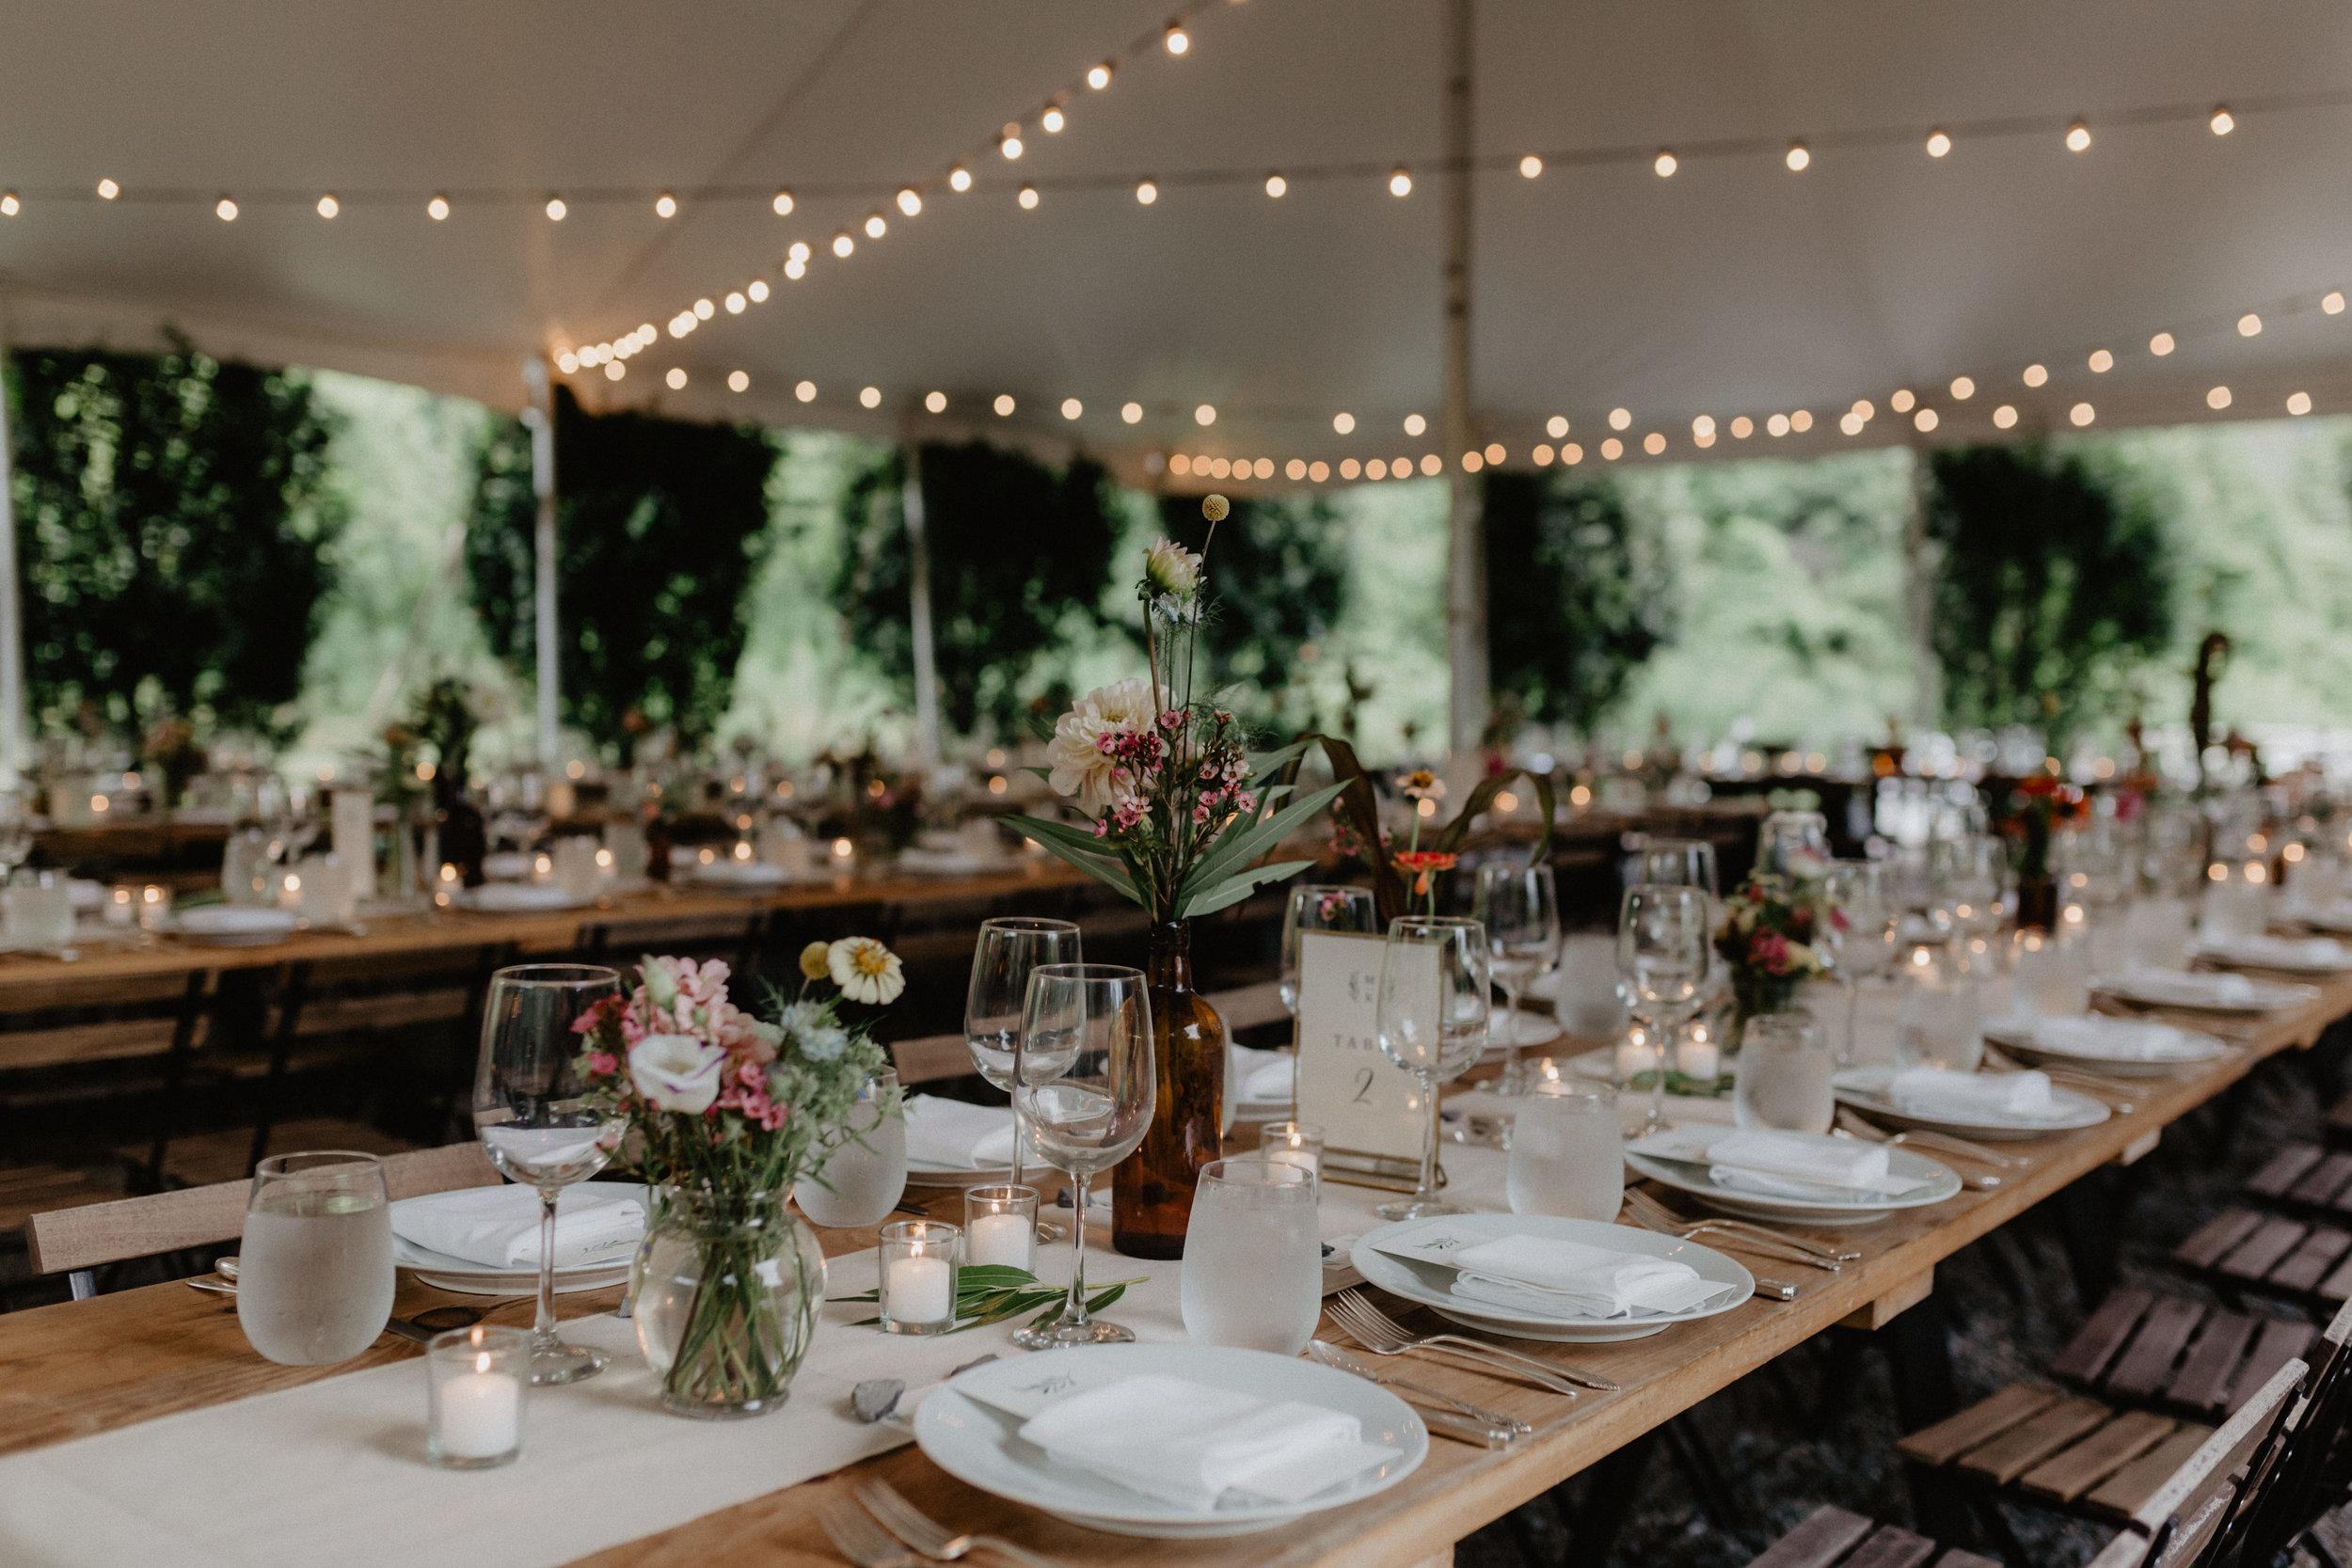 m-and-d-farm-wedding-89.jpg